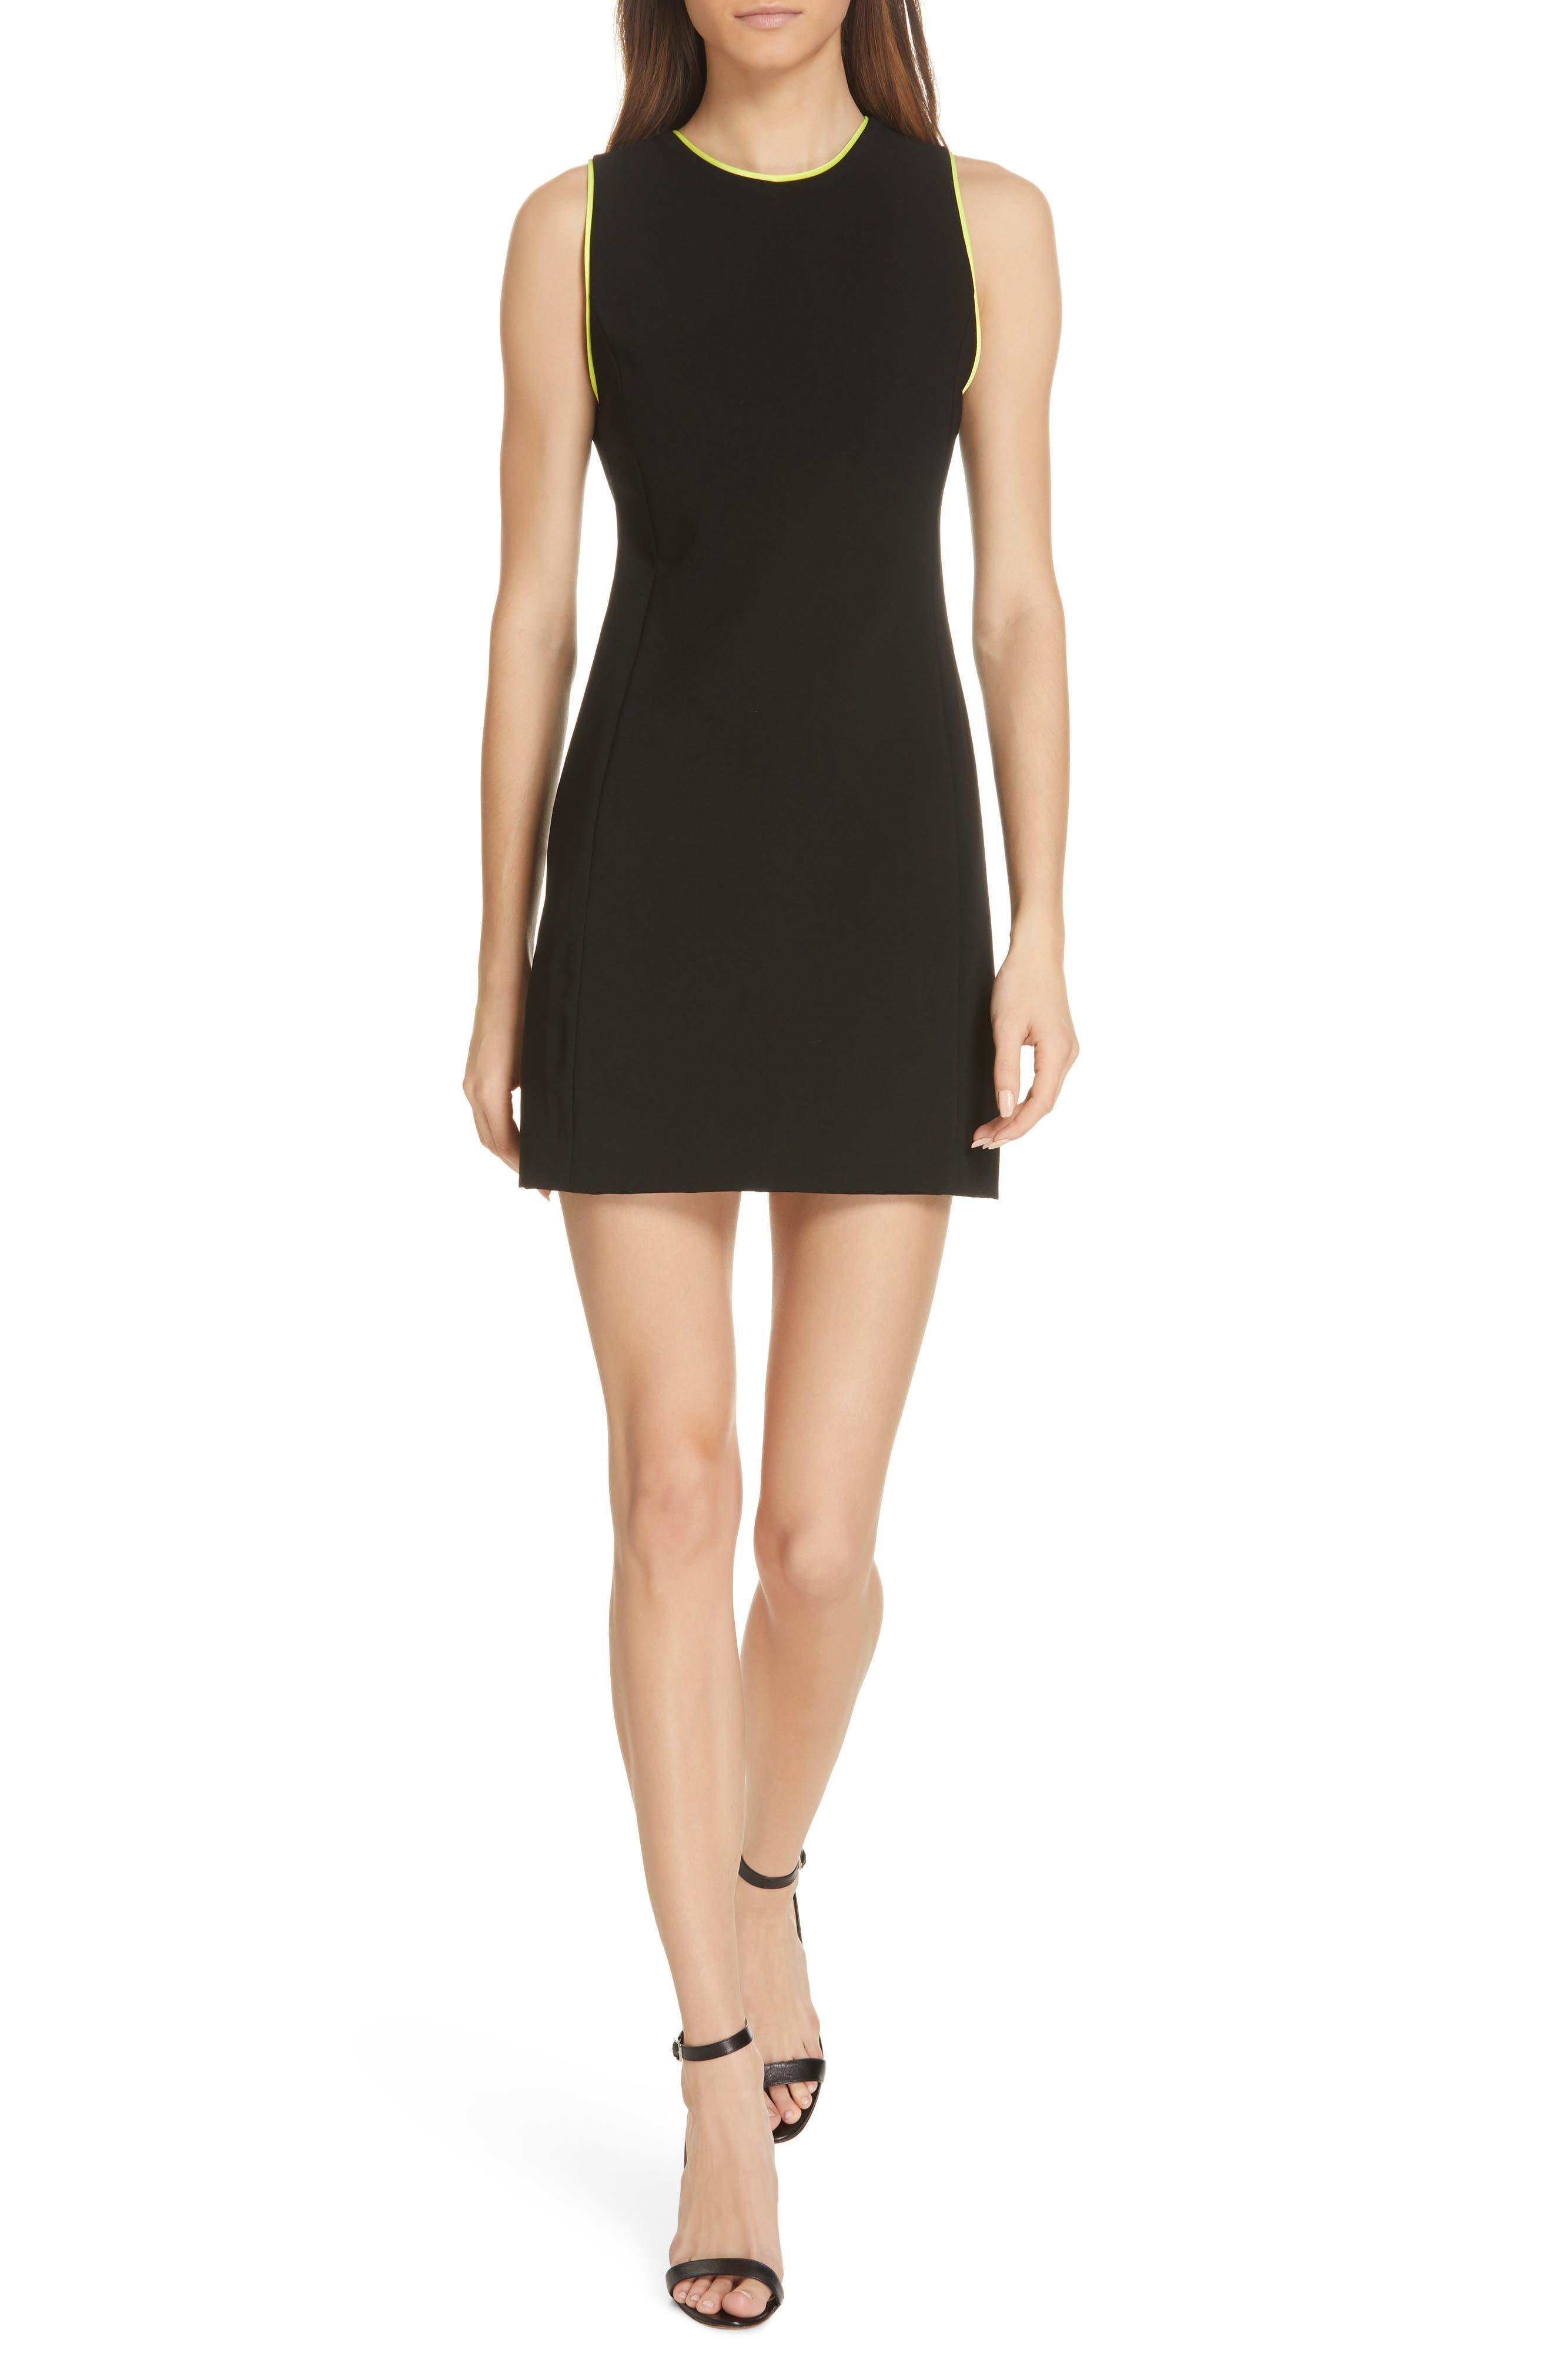 Alice + Olivia Clyde A-Line Dress, Black